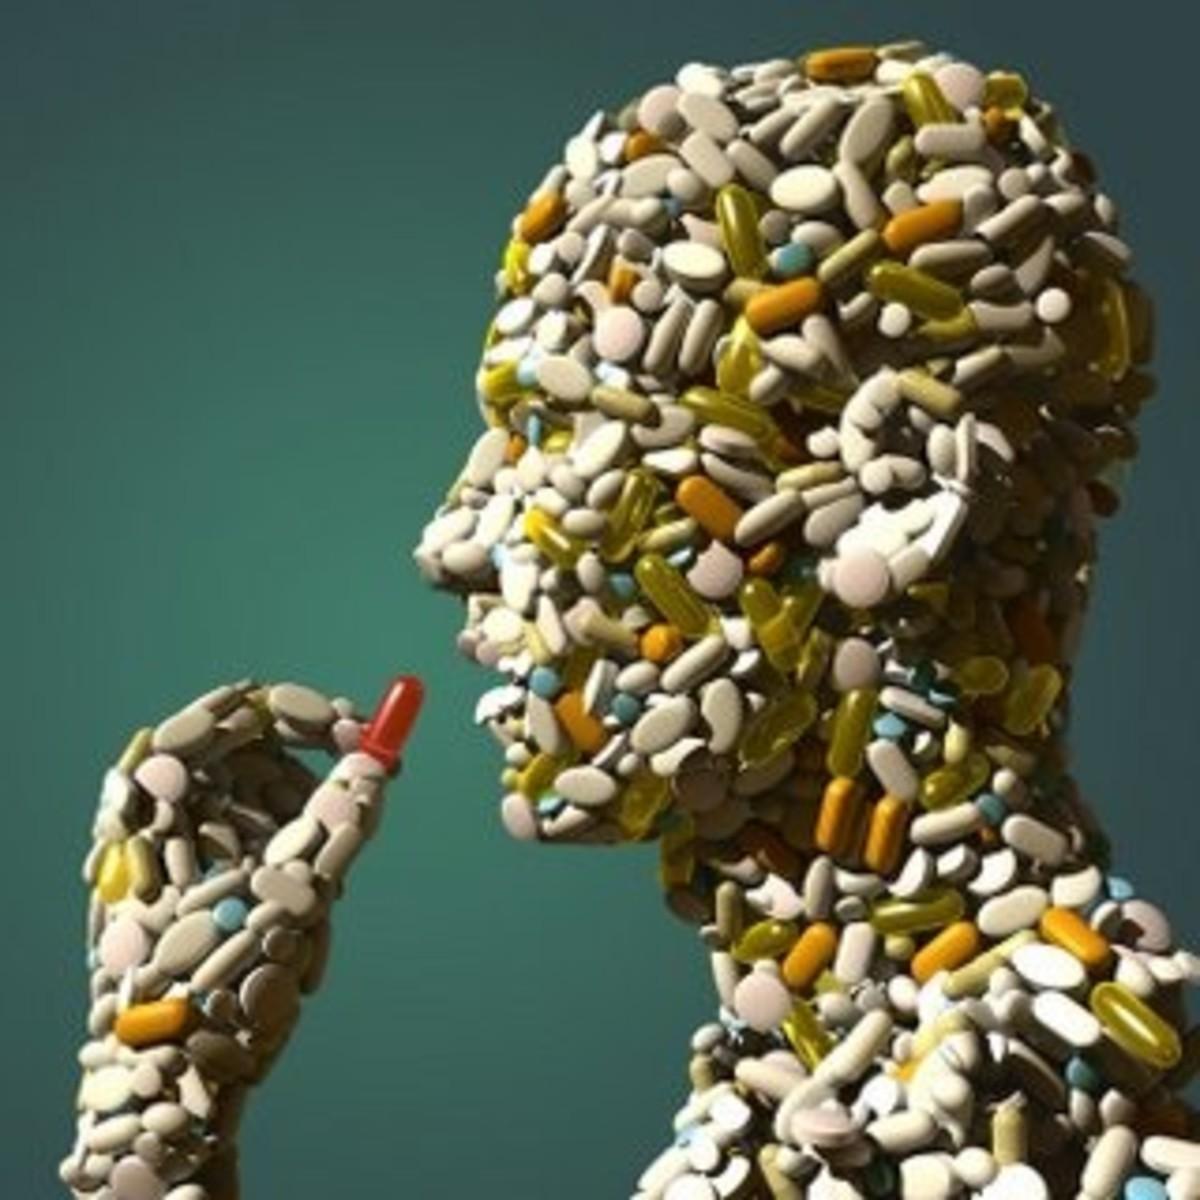 the-prescription-drug-addiction-epidemic-pain-killers-addictions-pain-clinics-pain-pills-pharmaceuticals